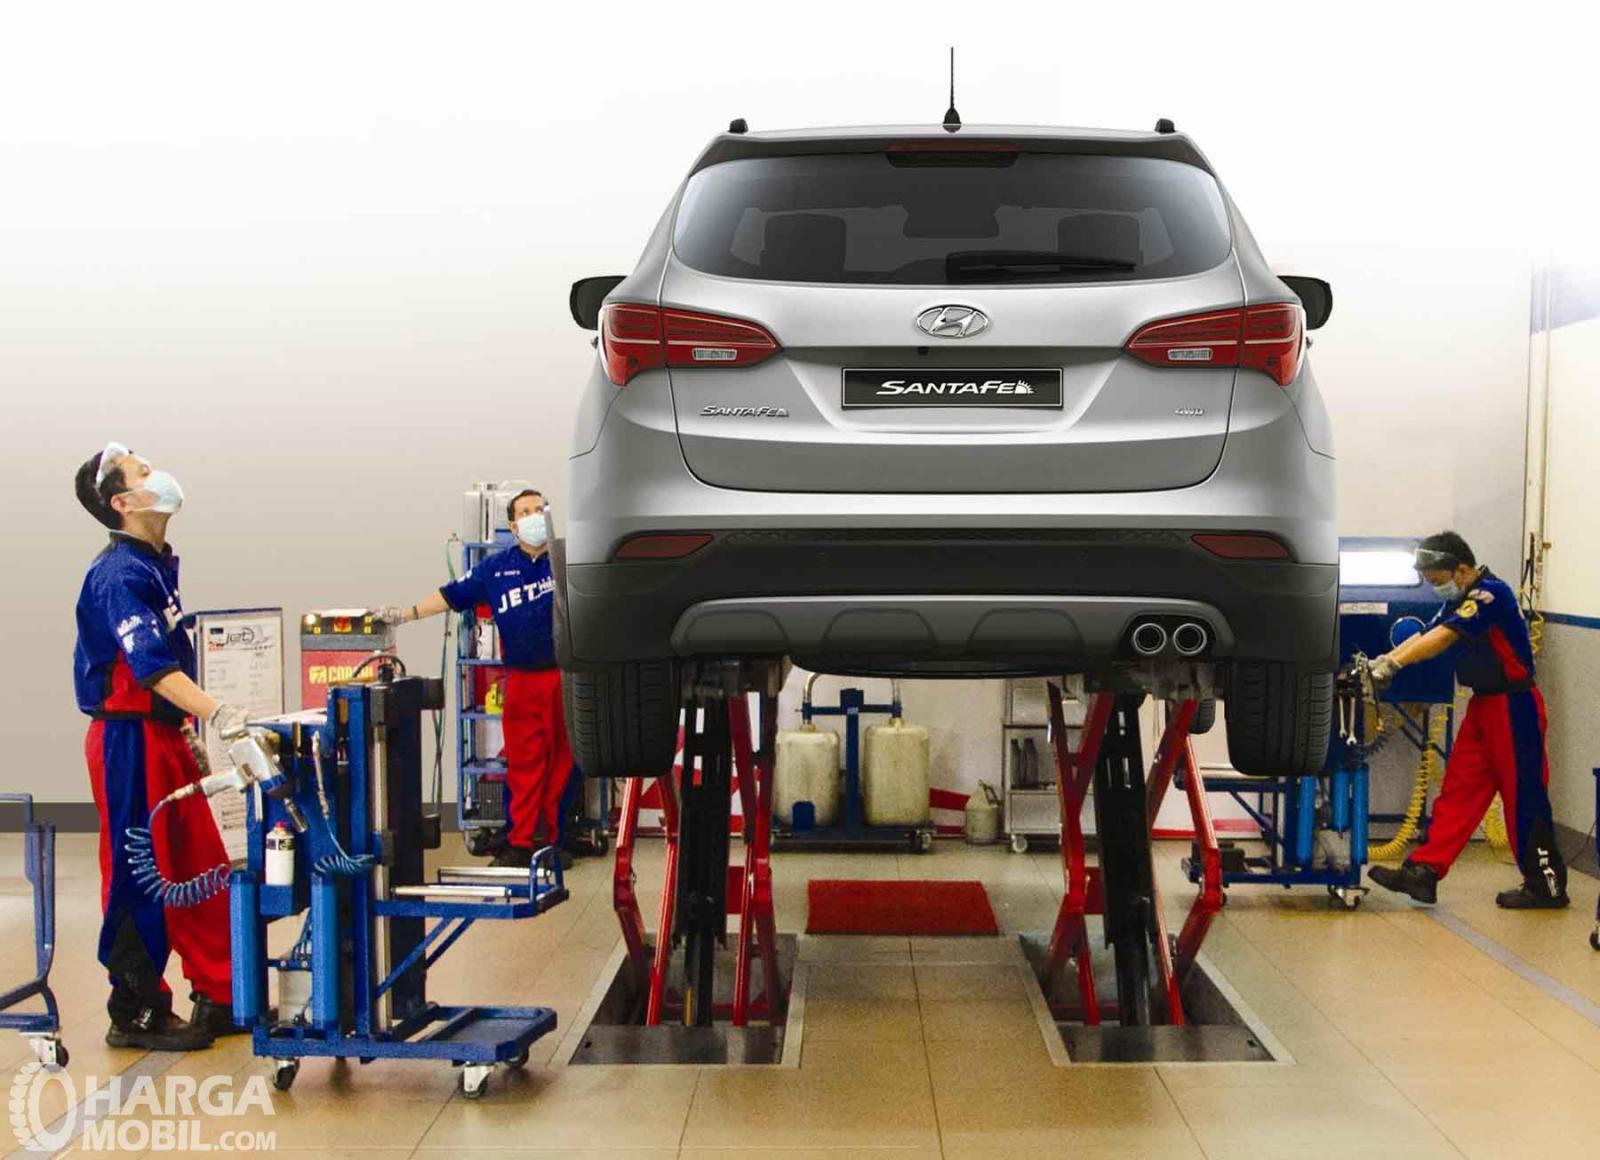 Foto Hyundai Santa Fe sedang diservis para mekanik